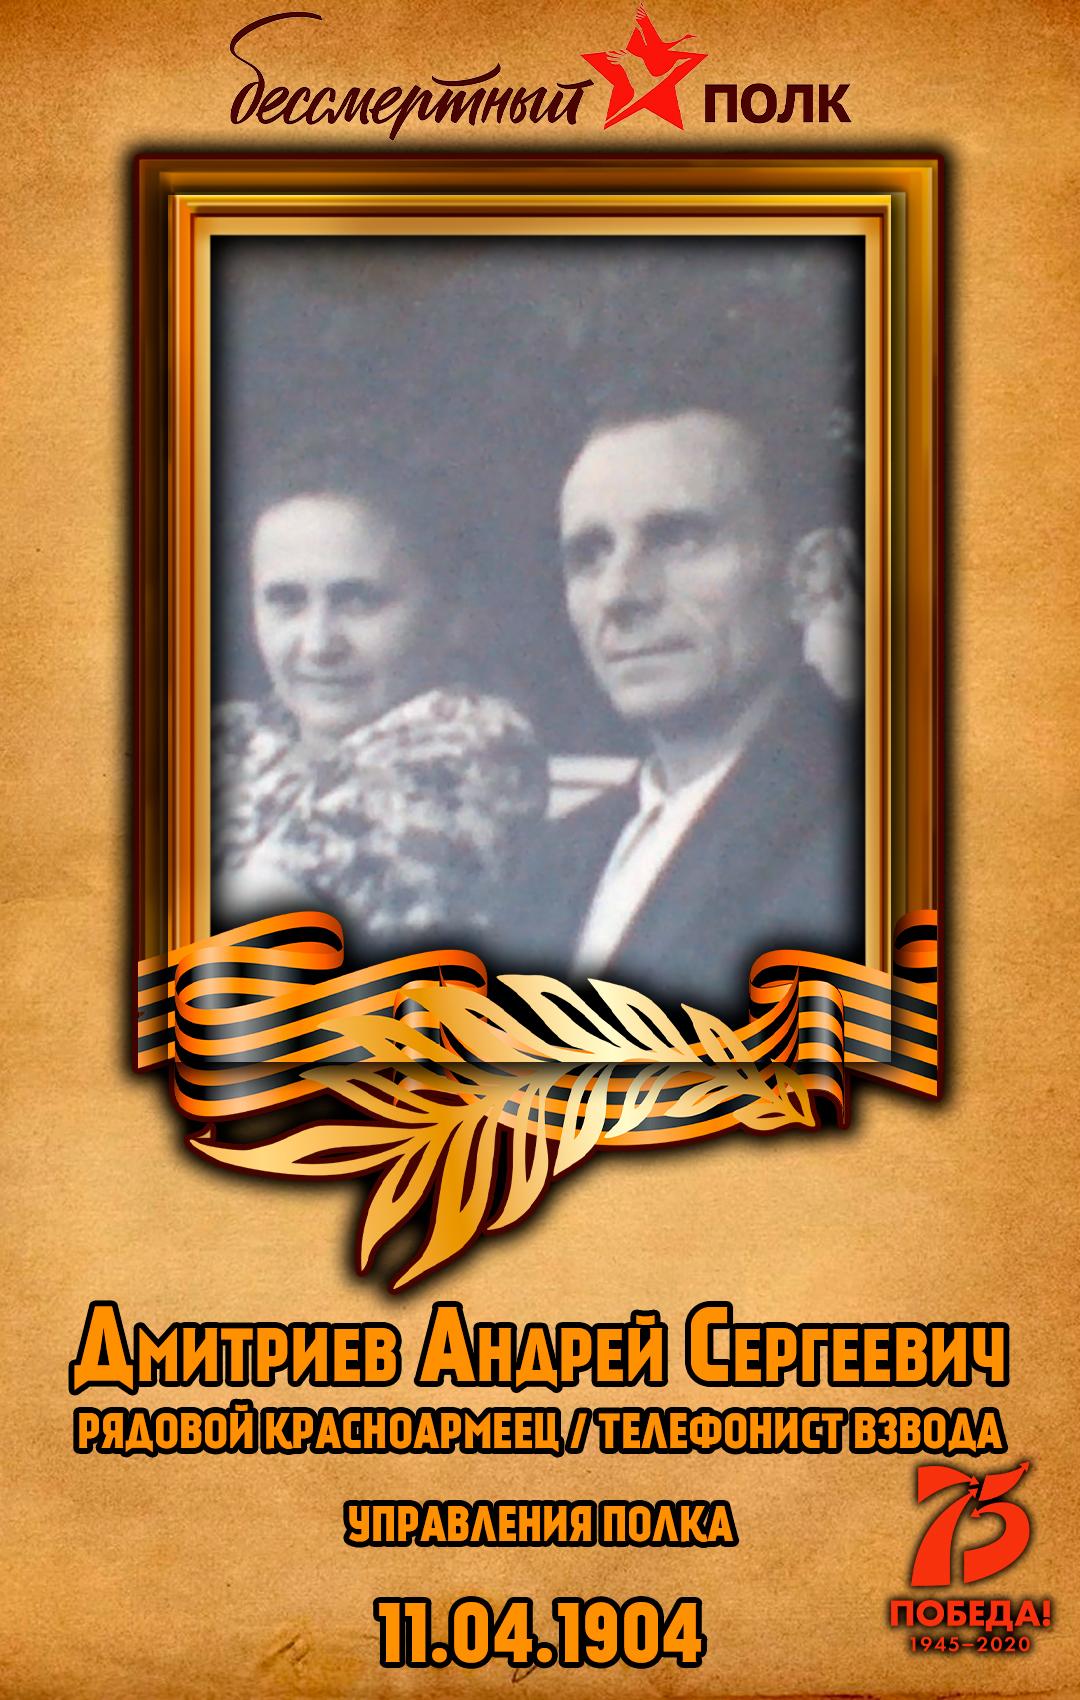 Дмитриев-Андрей-Сергеевич